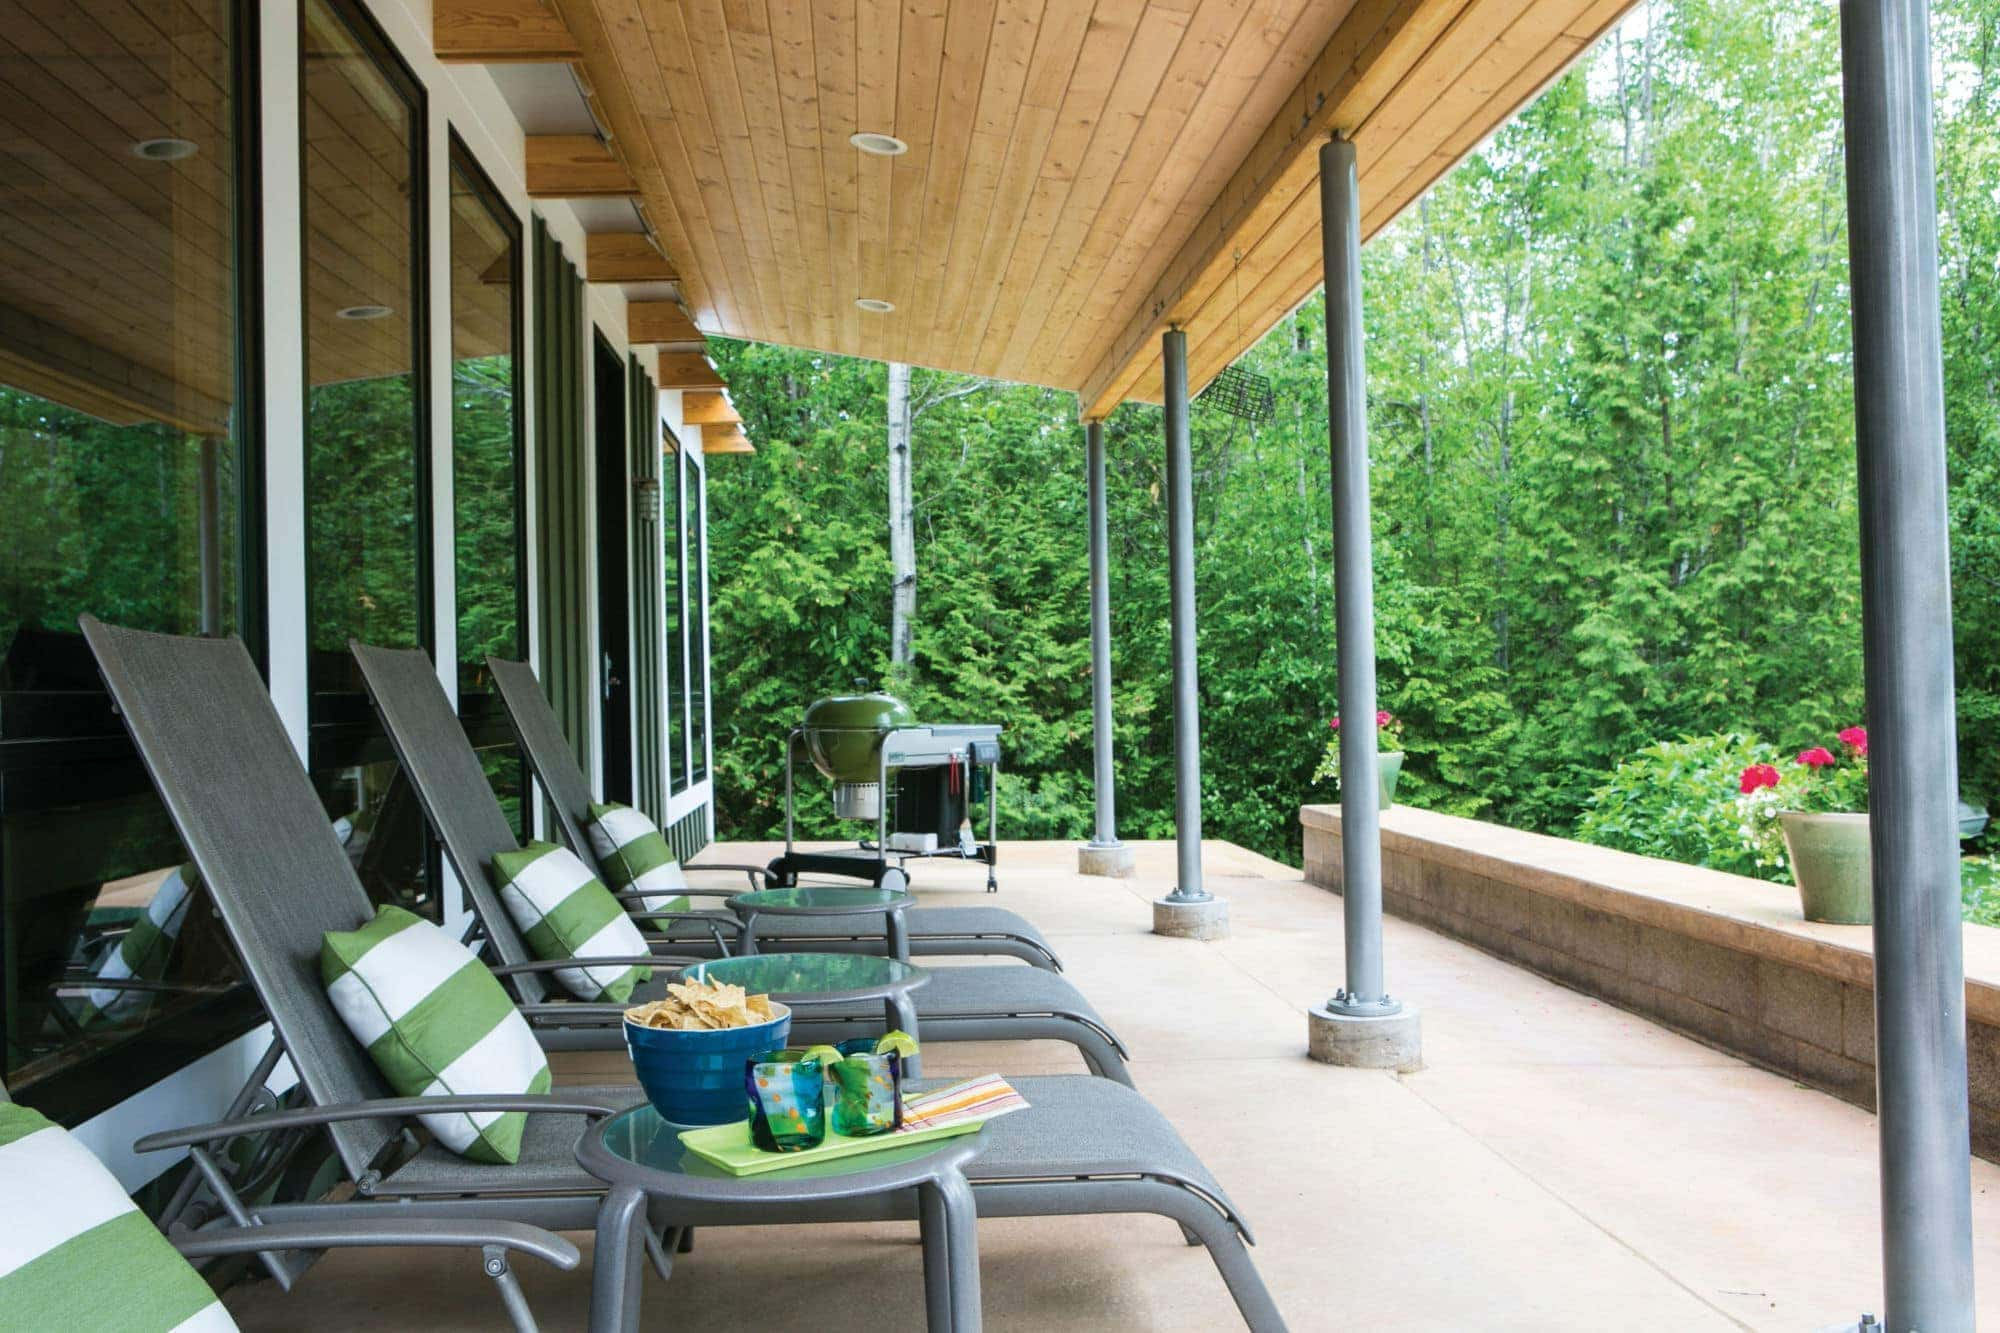 city com cottage rent villas place for mynorth in glen traverse cottages craft